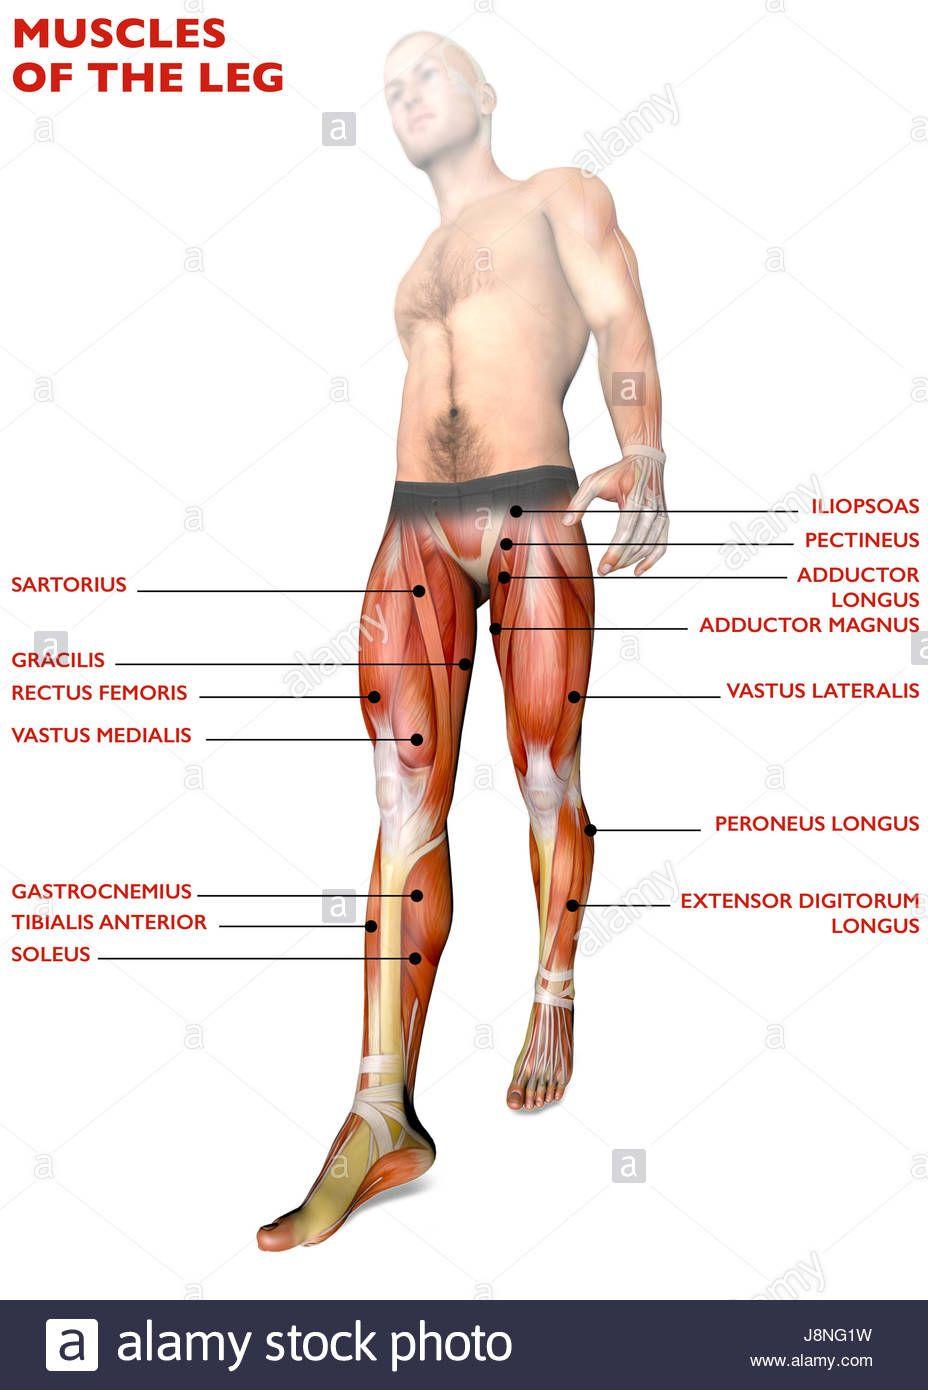 Leg Muscles Name Anatomy Note World Pinterest Leg Muscles